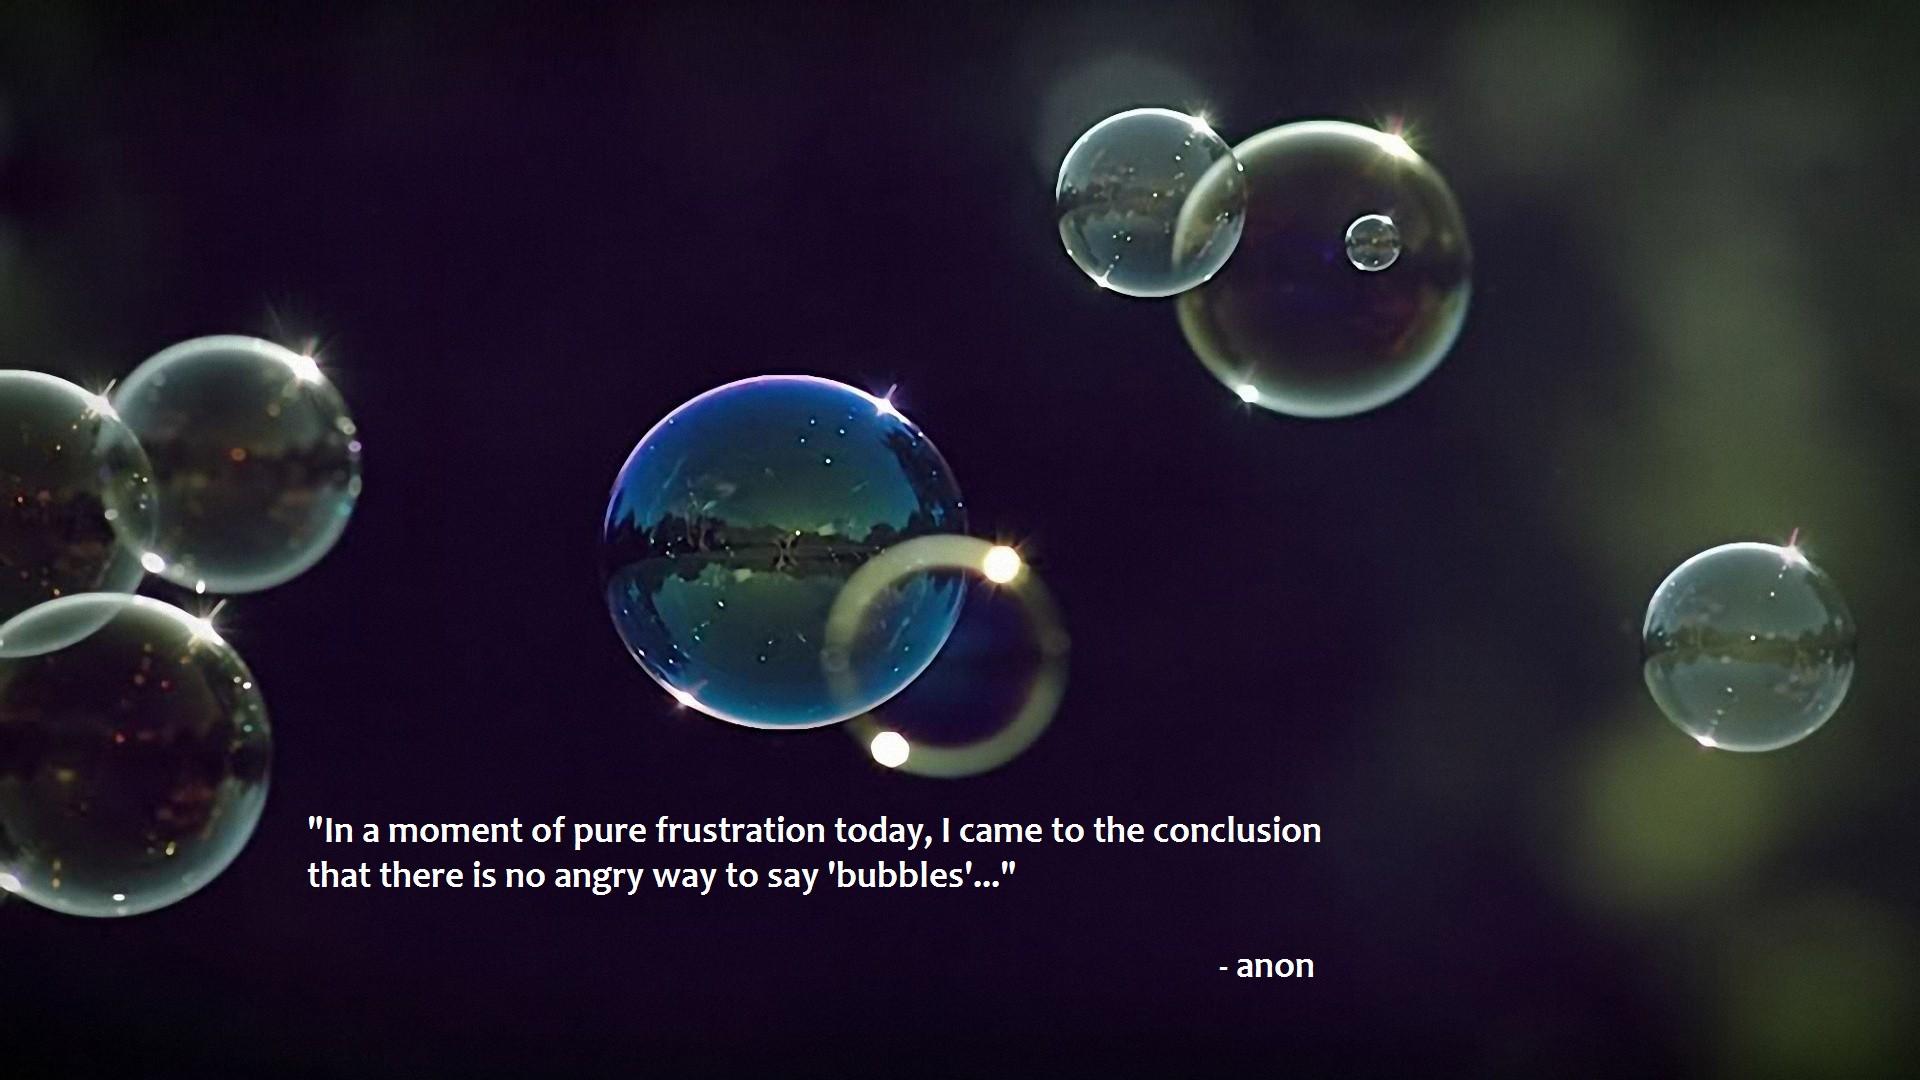 Conclusion quote #2